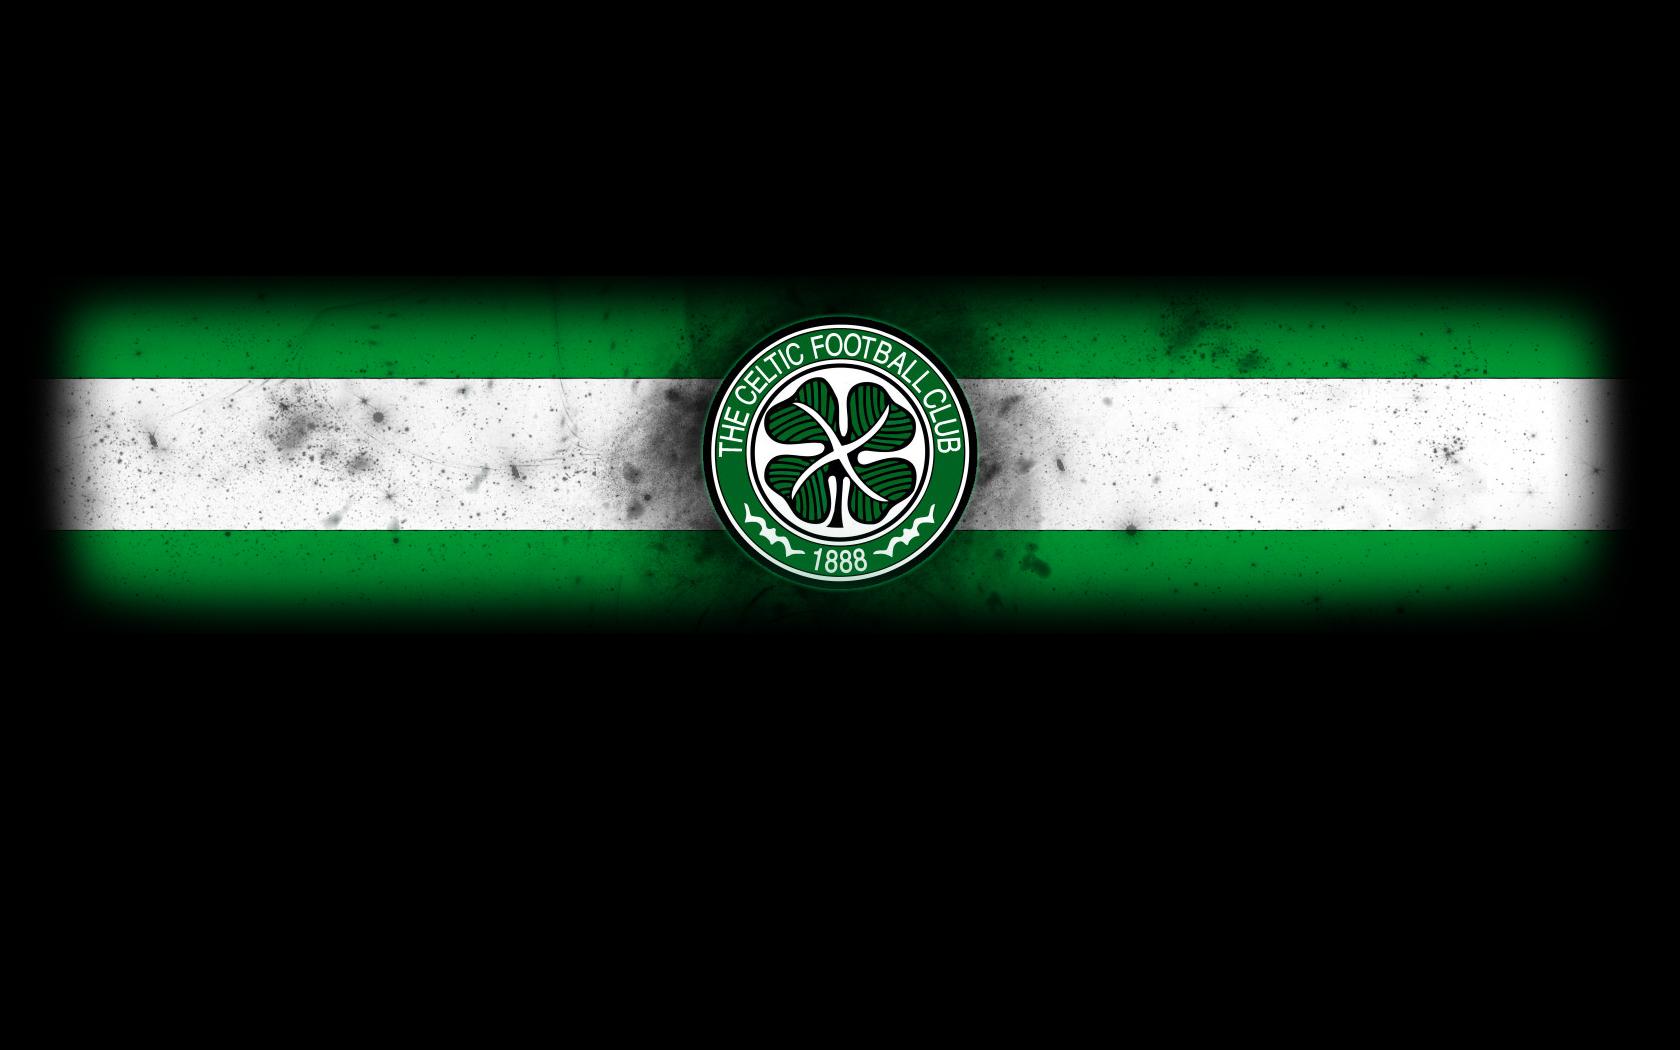 FC Celtic Wallpaper By Mlmhawk On DeviantArt